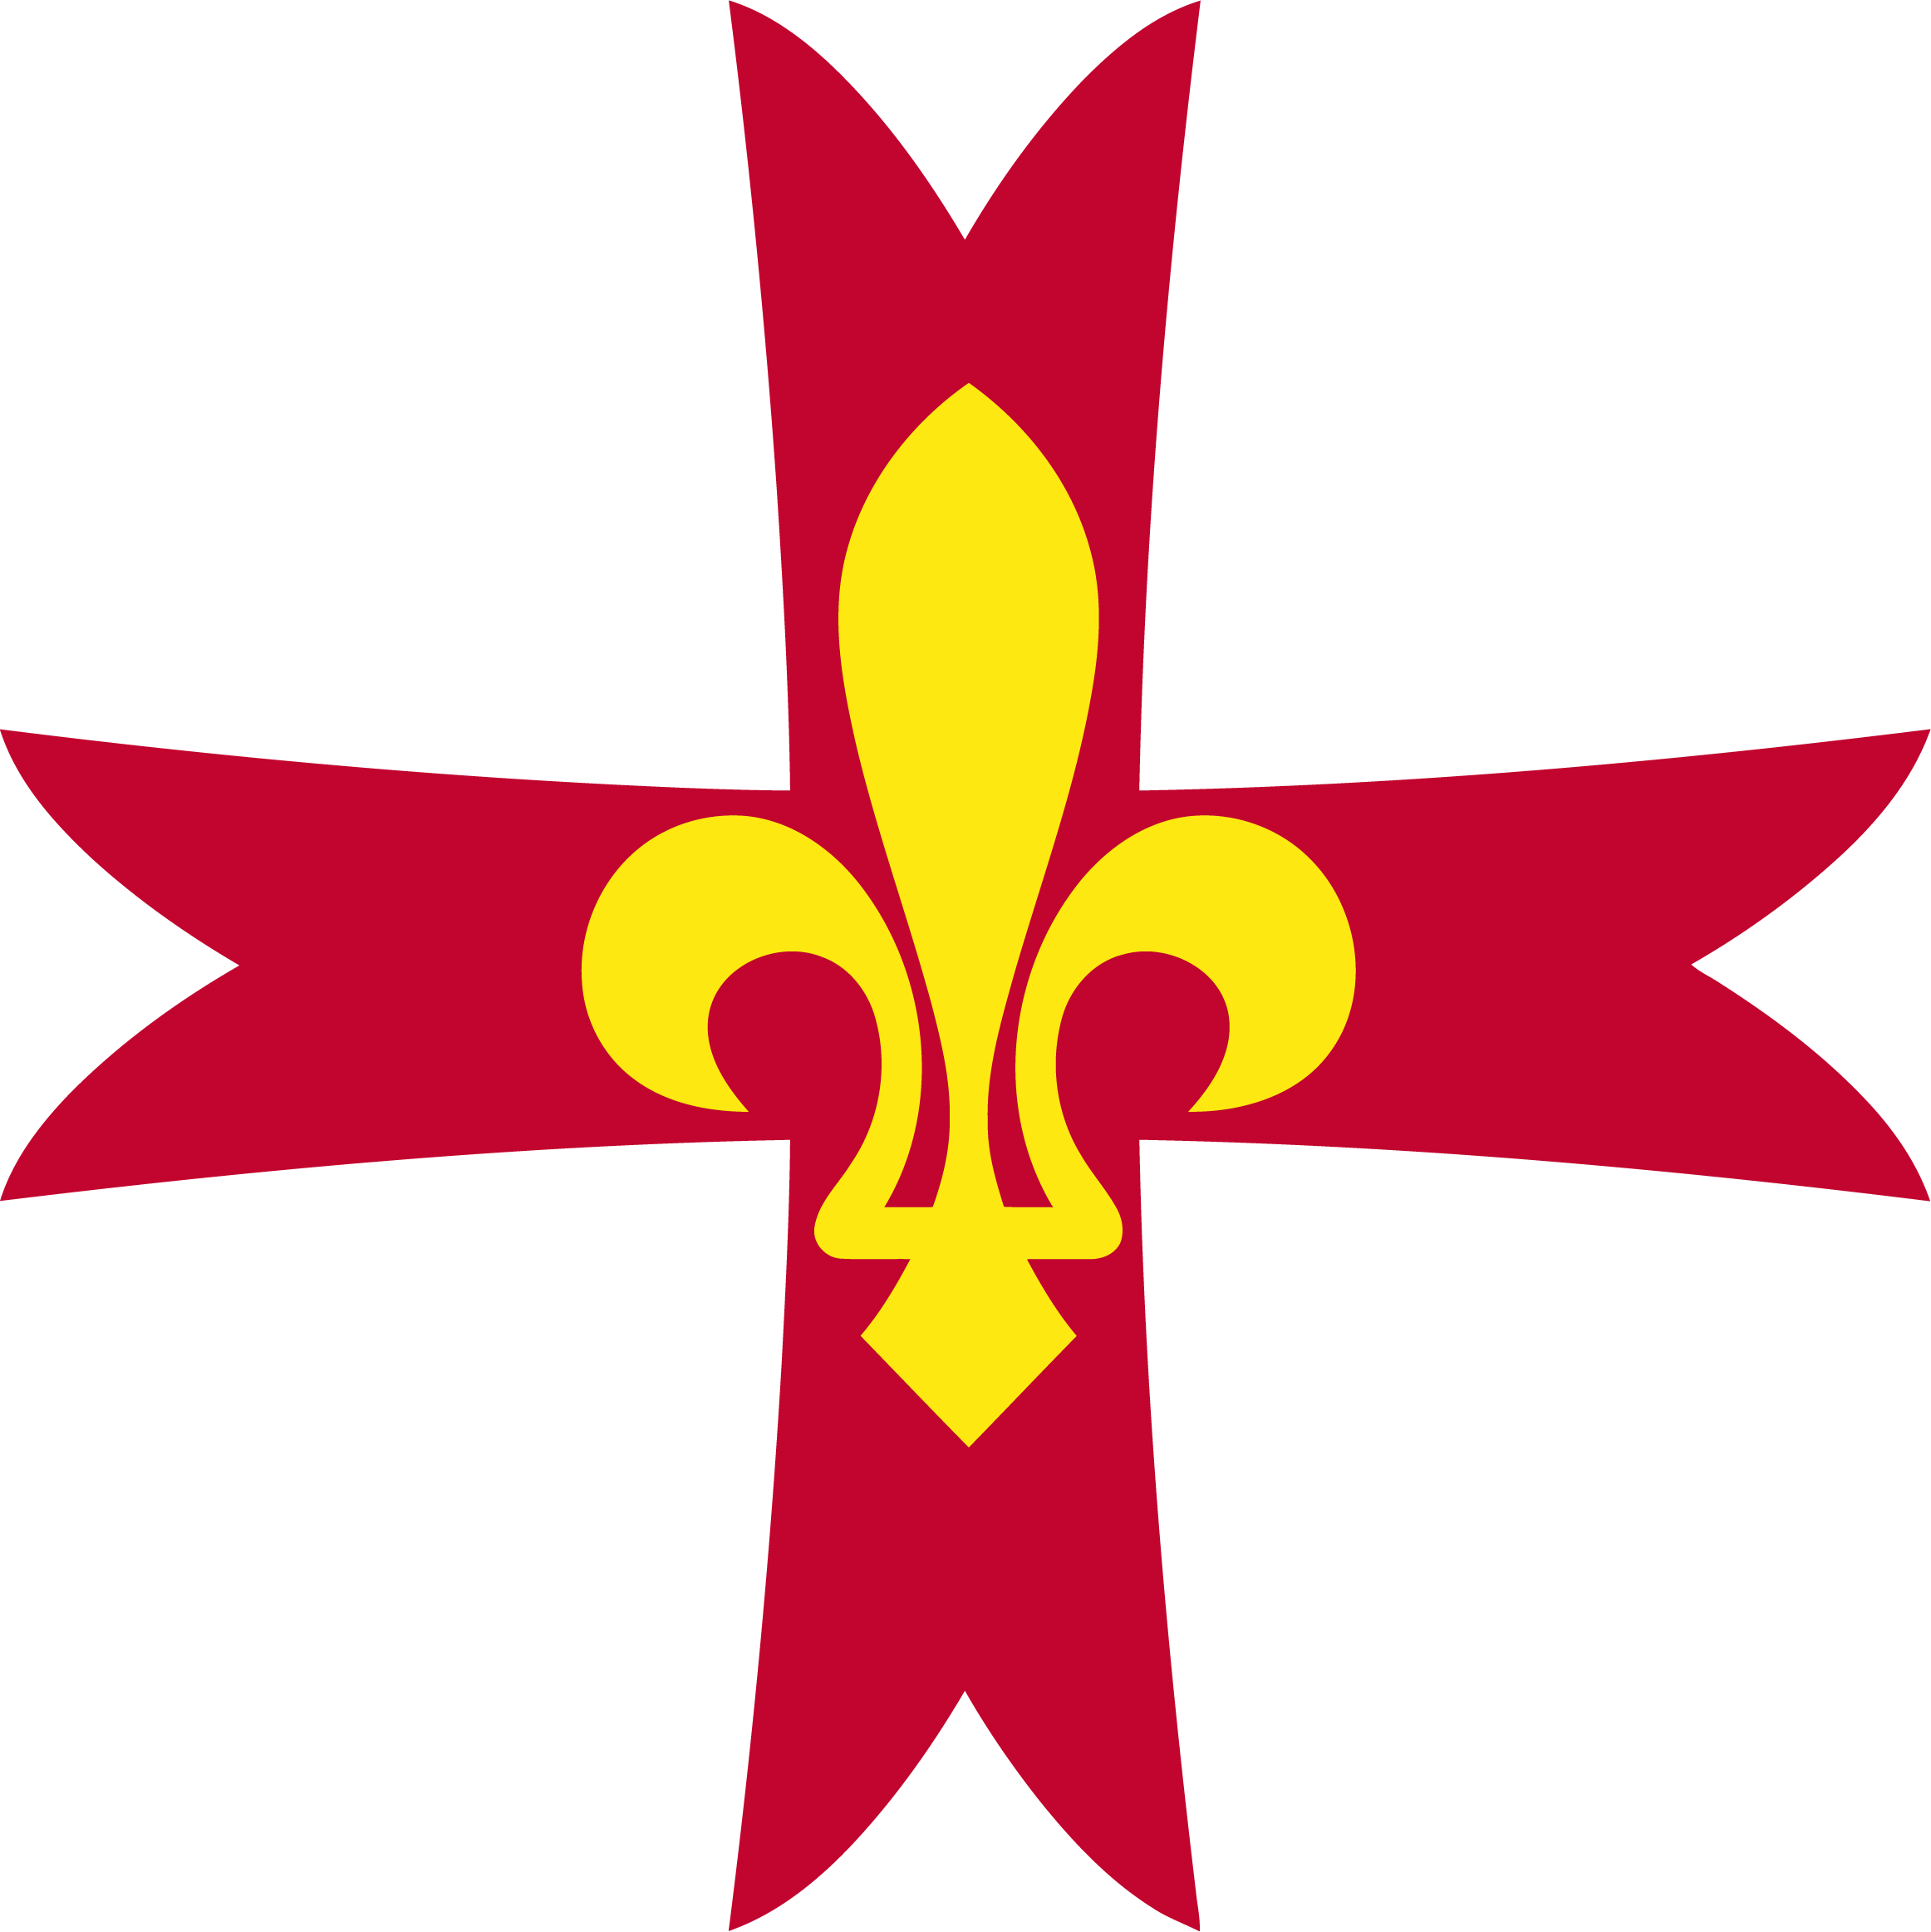 GSE-Namur